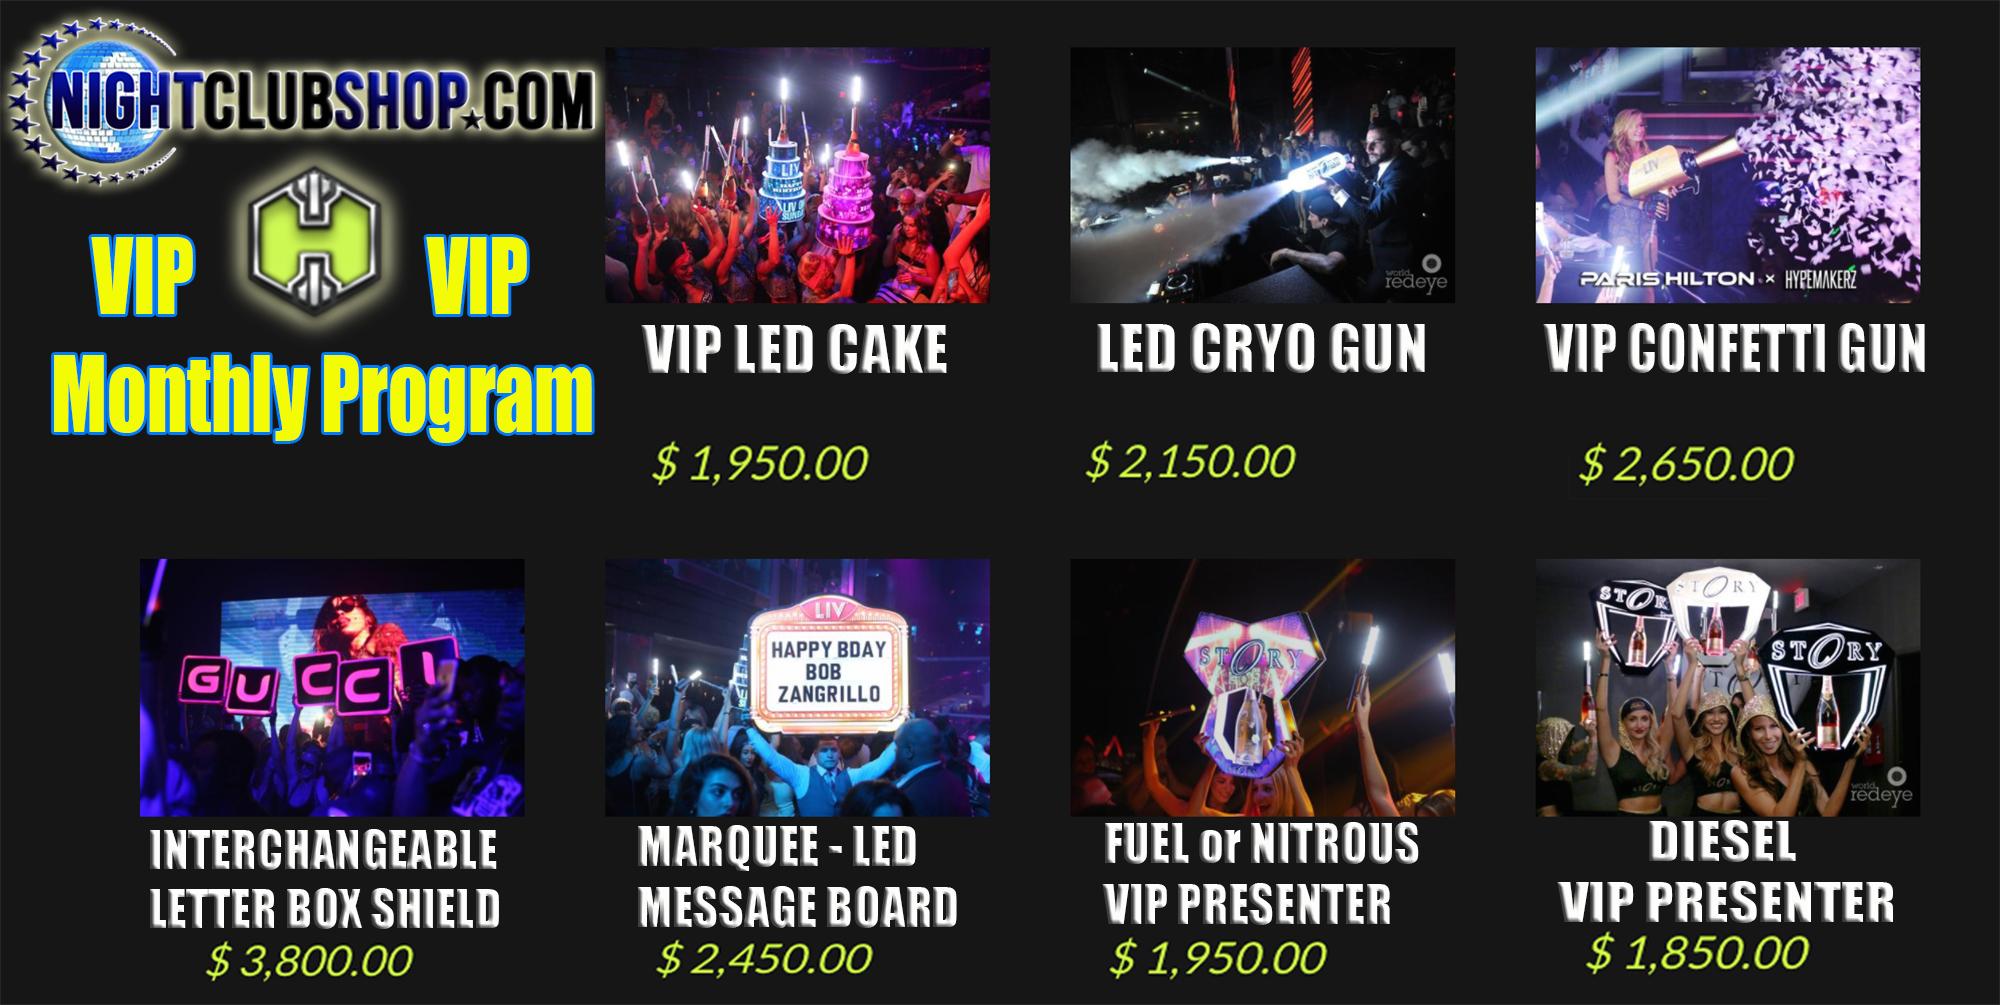 1.vip-monthly-service-program-bottle-service-productsnightclub-bar-dj-bottle-service-plan-lease-nightclubshop.jpg